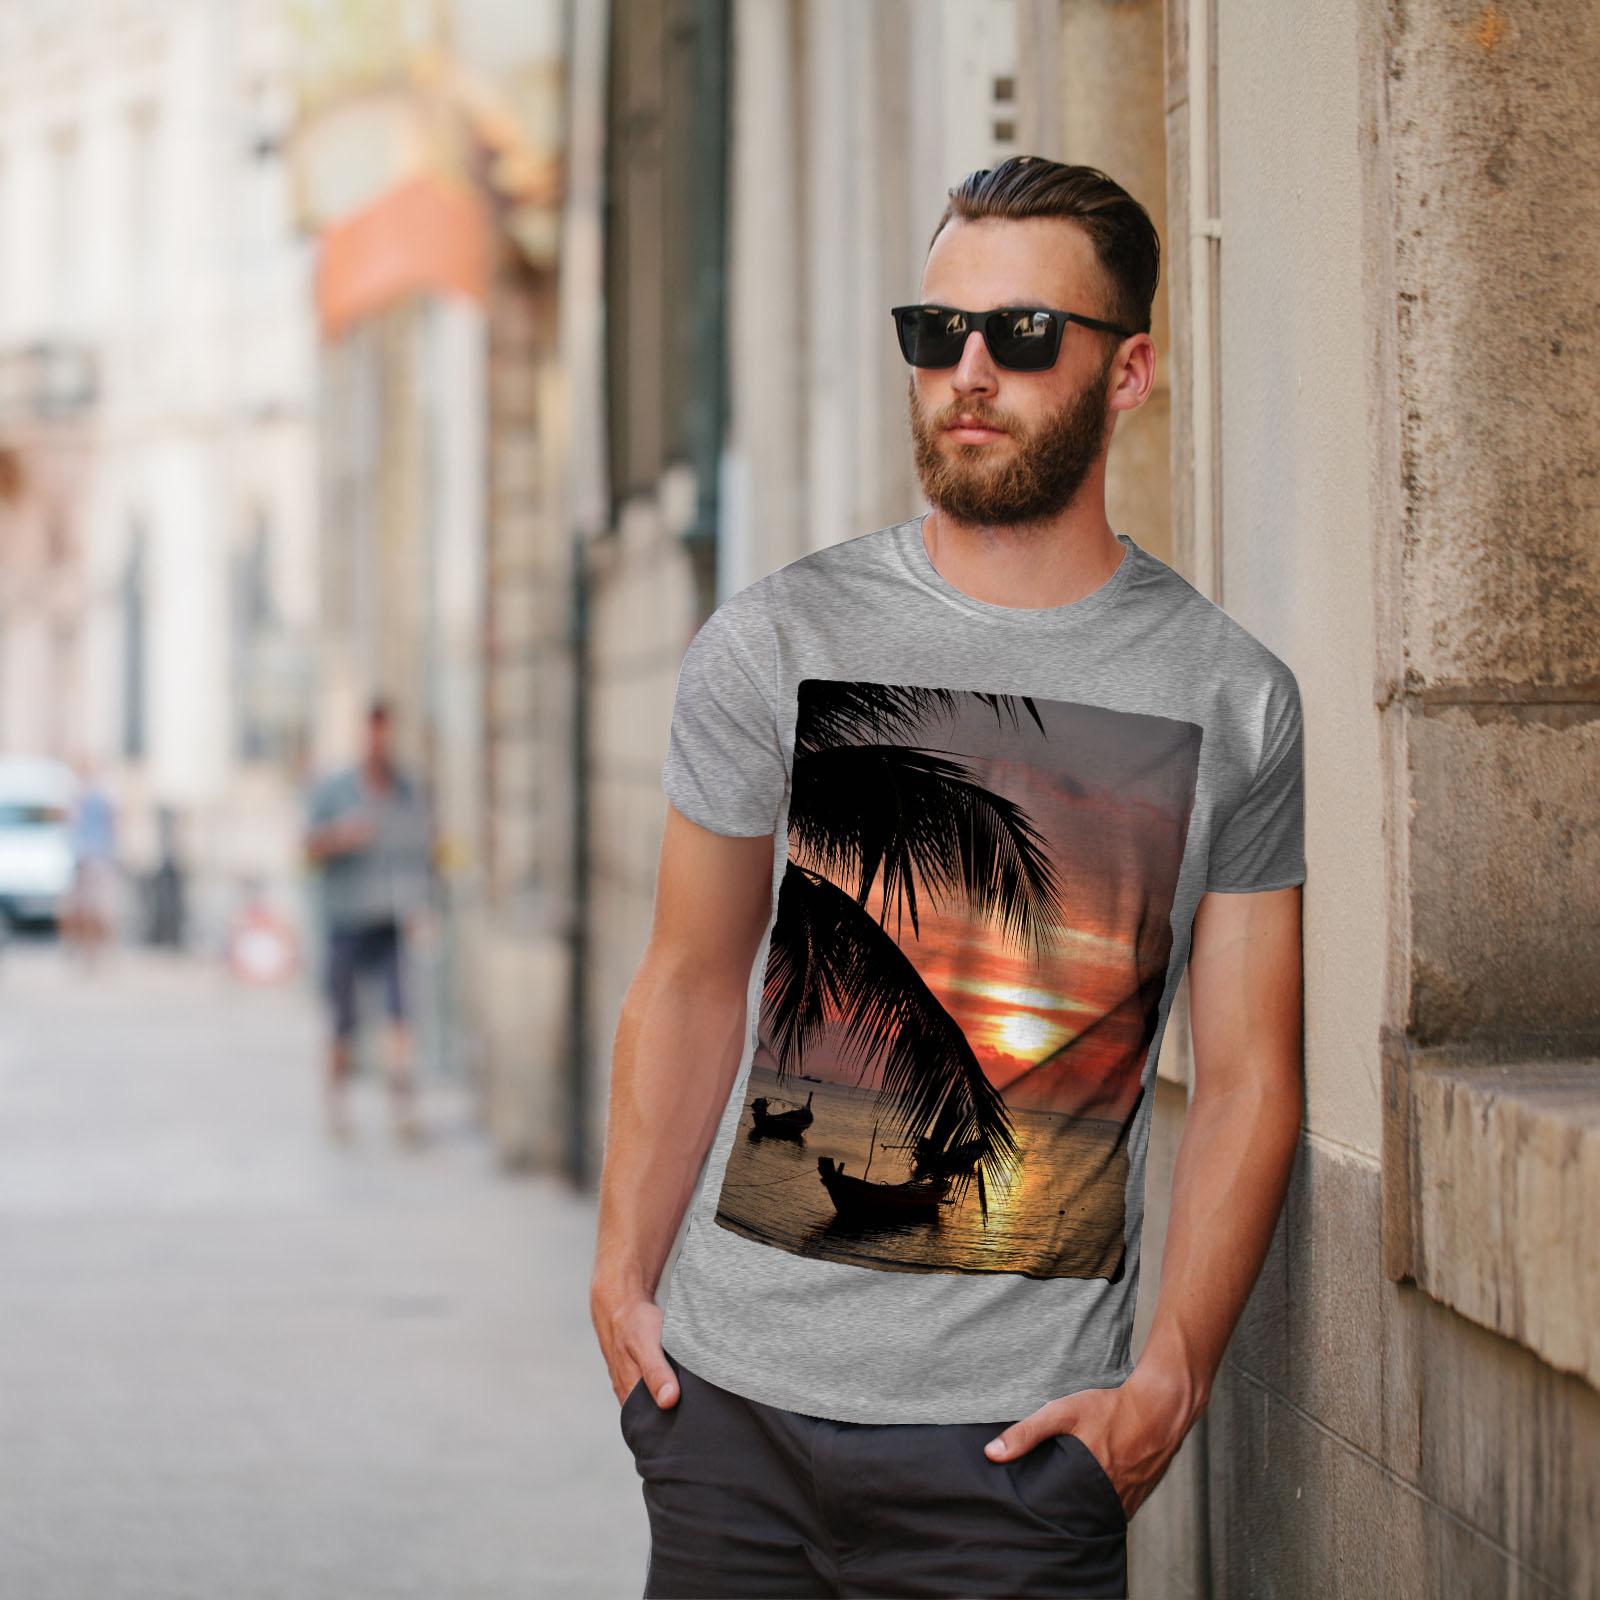 Wellcoda-Sunset-Palm-Tree-Mens-T-shirt-Ocean-Beach-Graphic-Design-Printed-Tee thumbnail 17